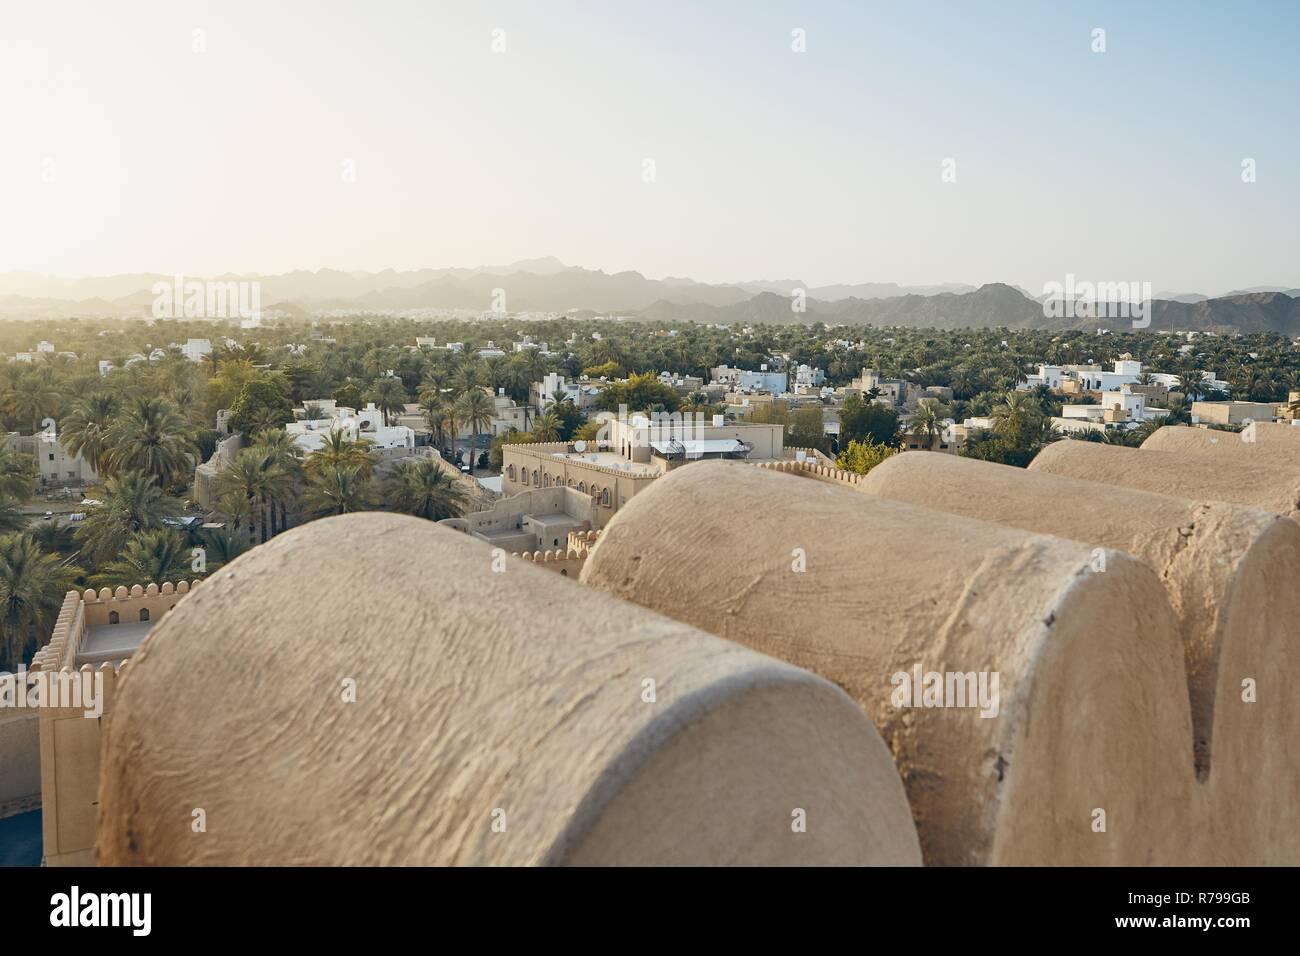 City against mountain range at idyllic sunset. Nizwa in Sultanate of Oman. Stock Photo